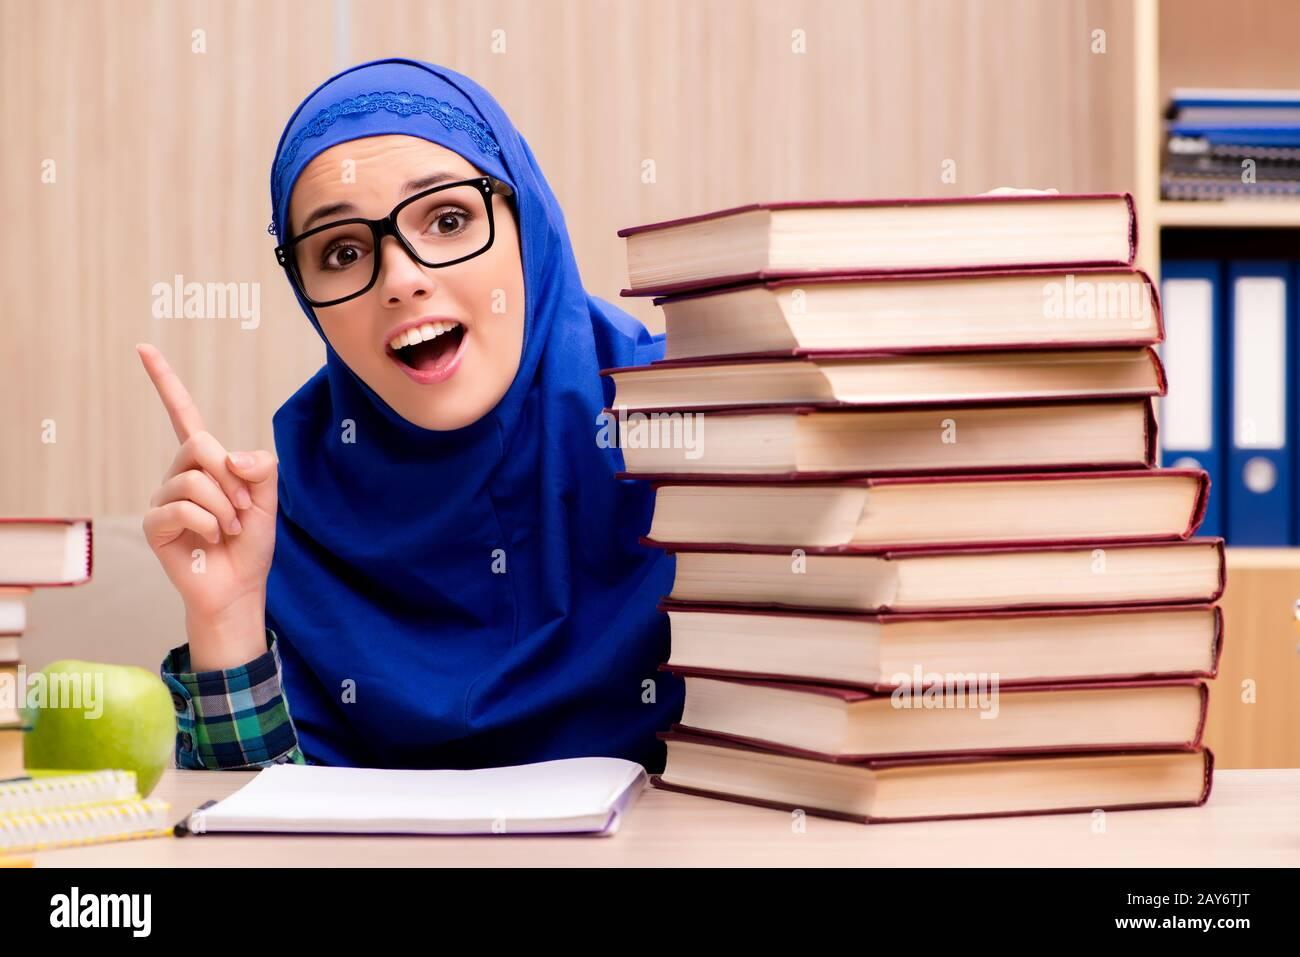 Muslim girl preparing for entry exams Stock Photo